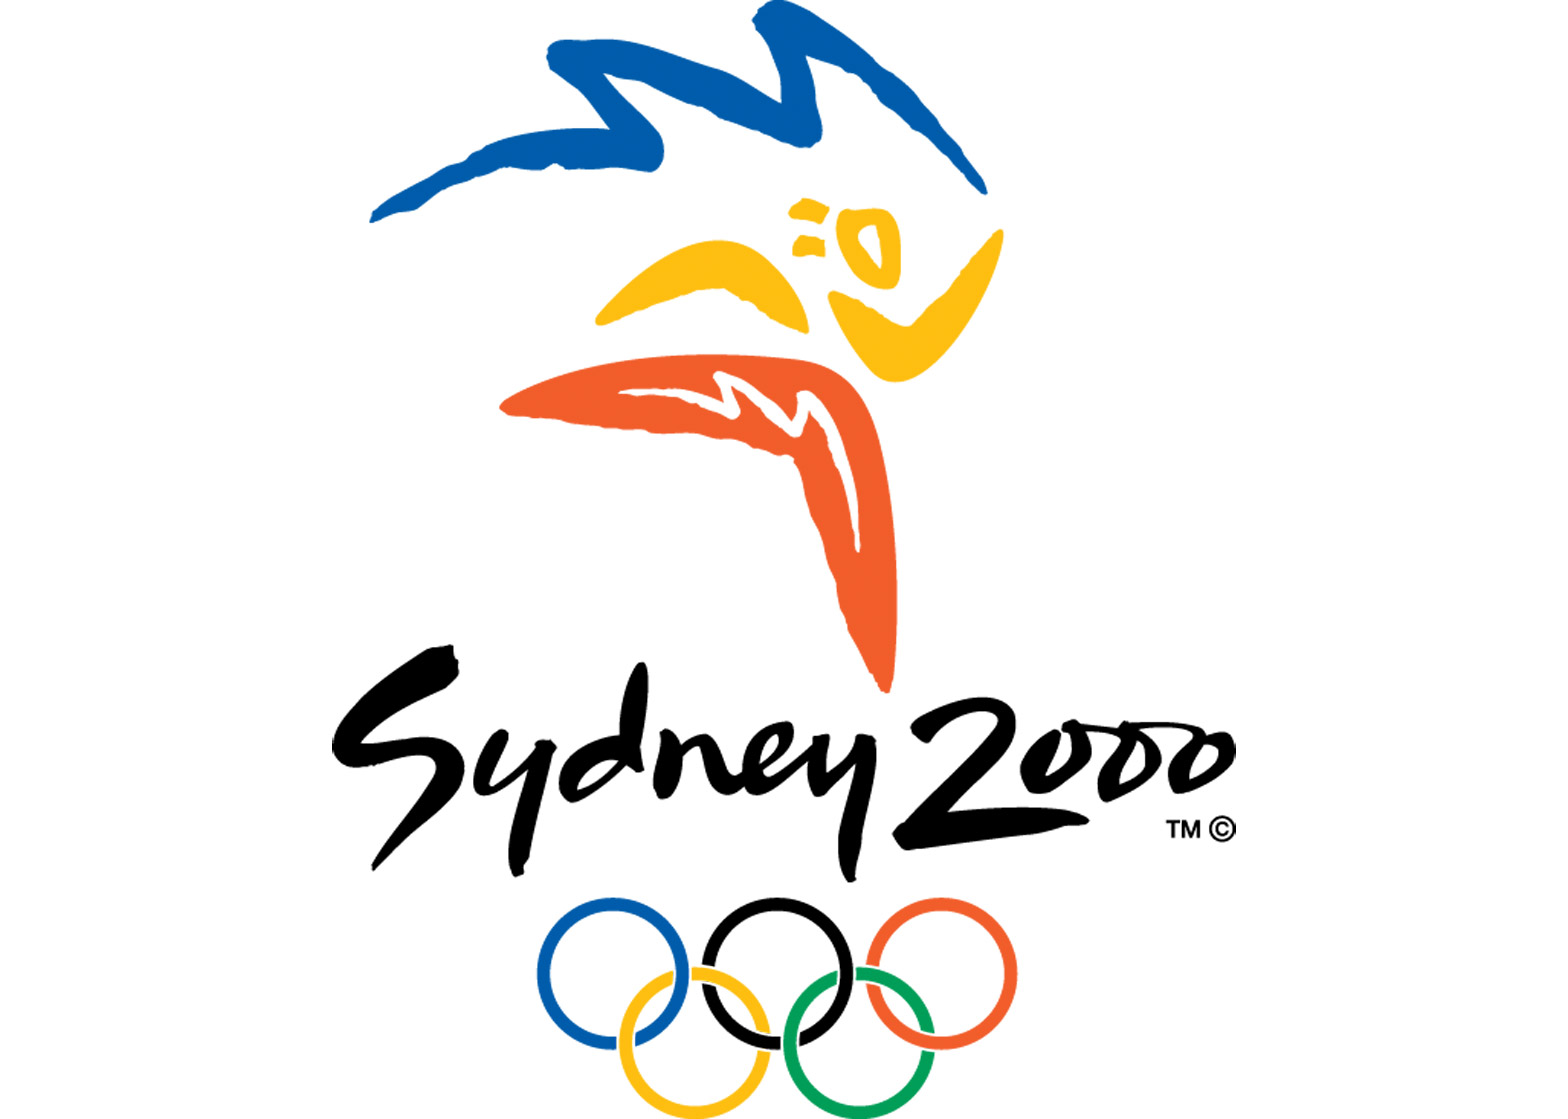 Logo of the 2000 Sydney Olympics